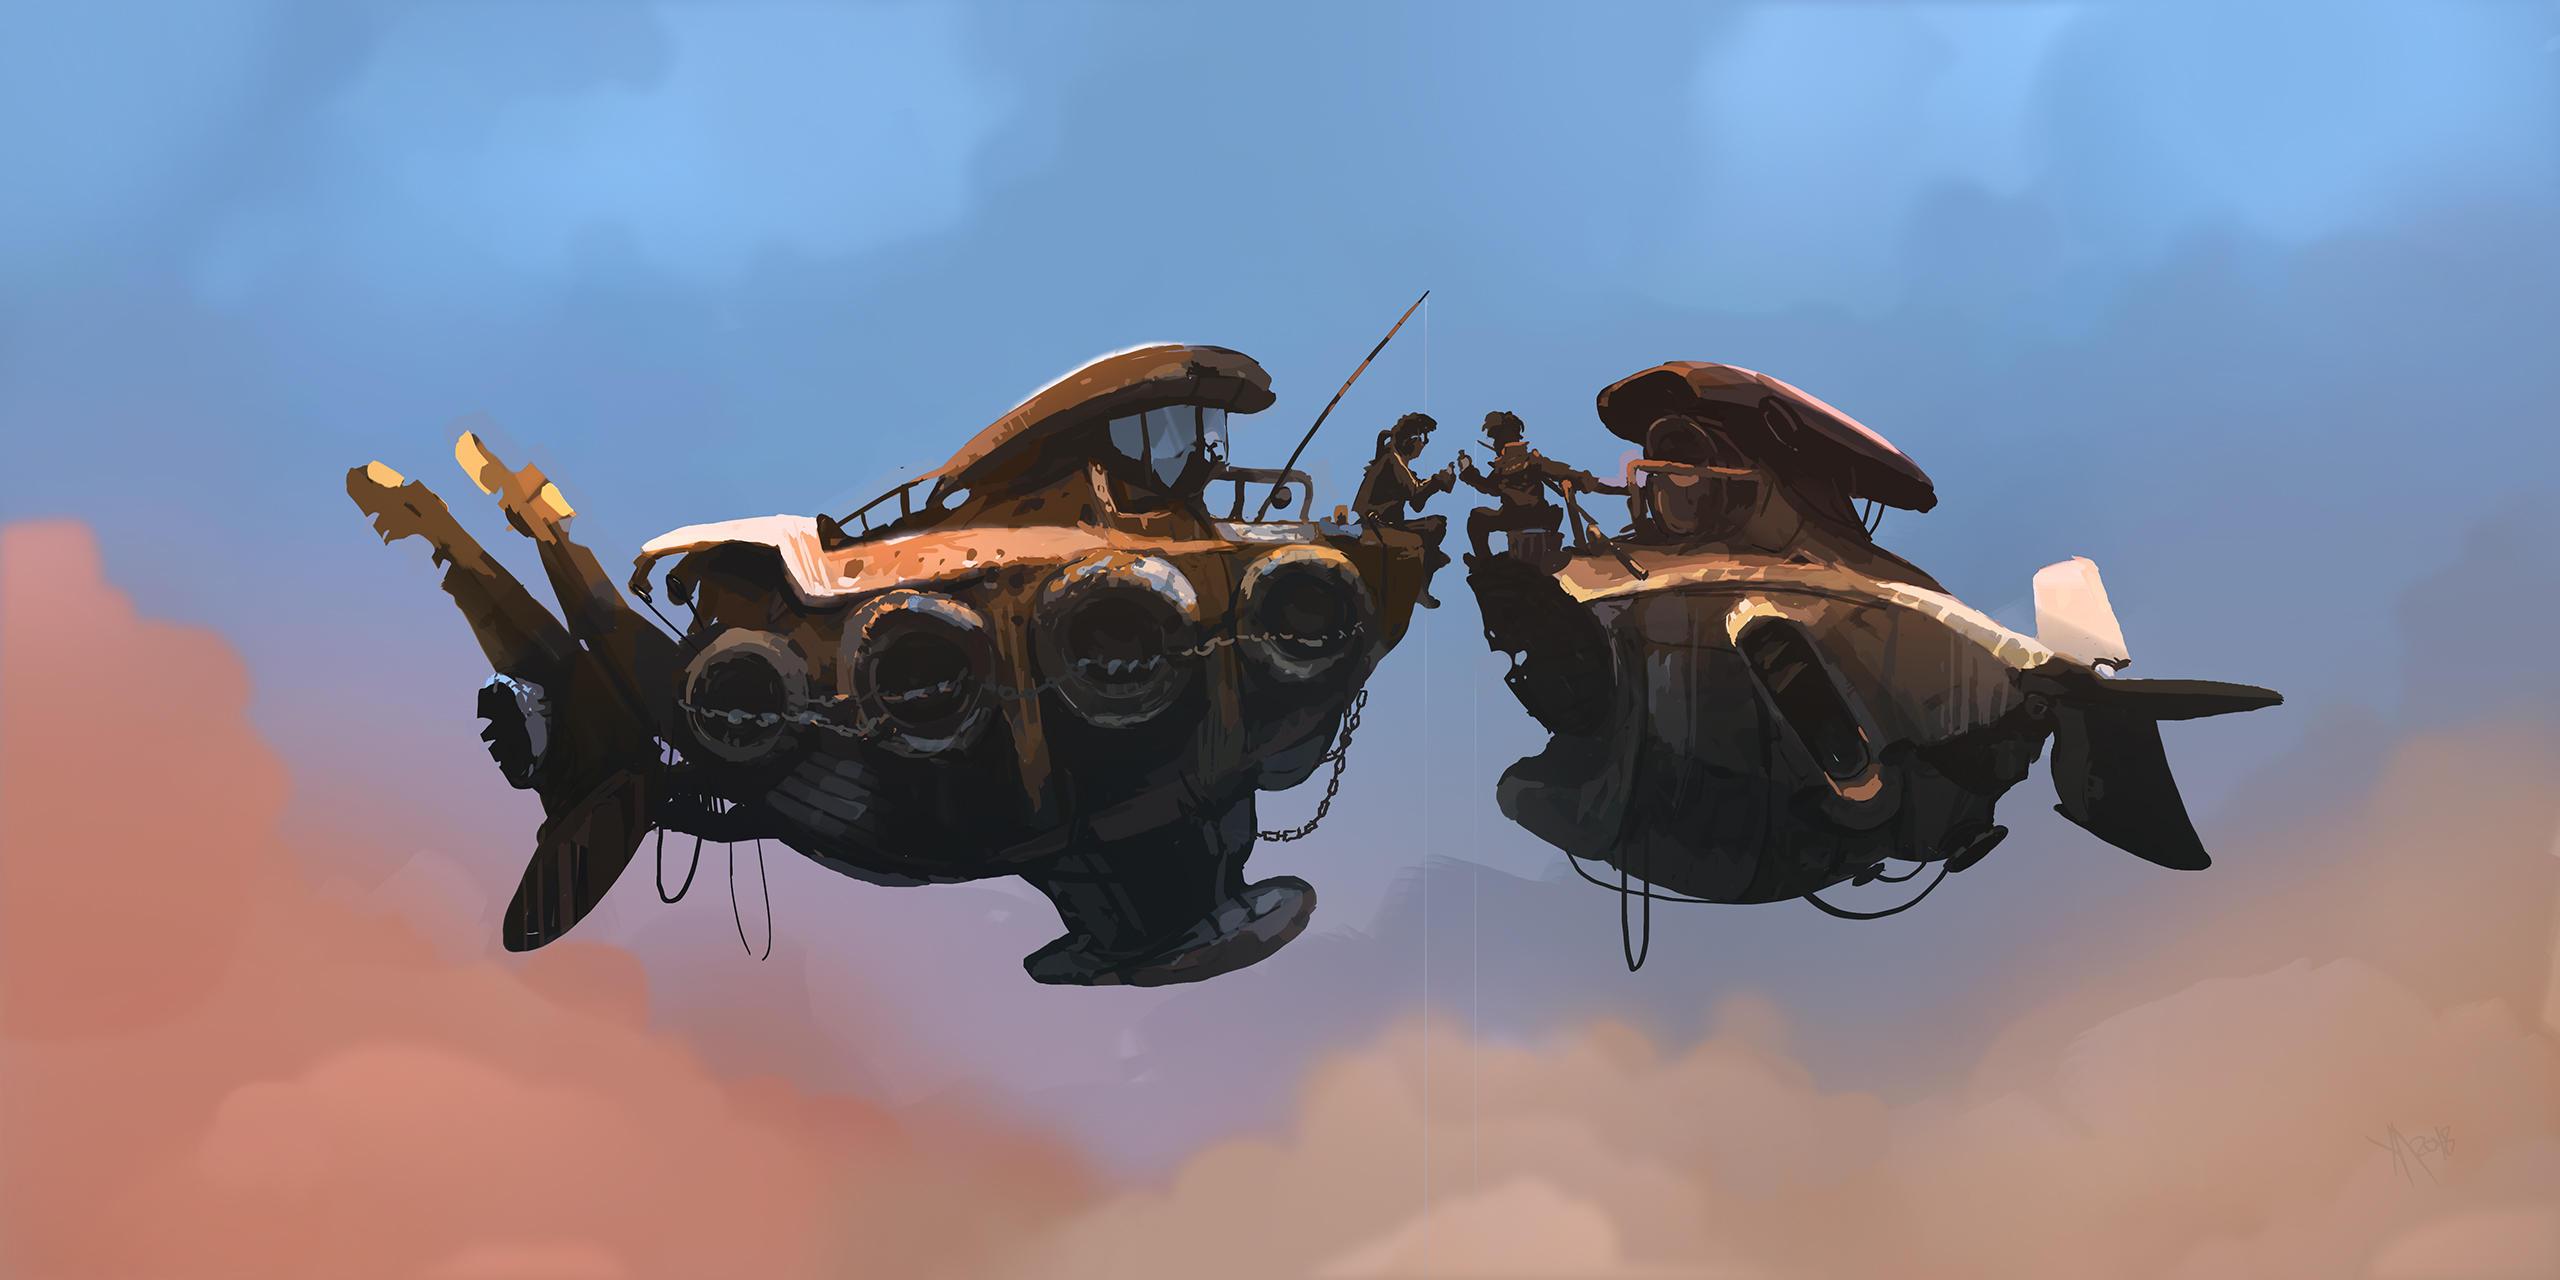 Between Fishing by Weilard